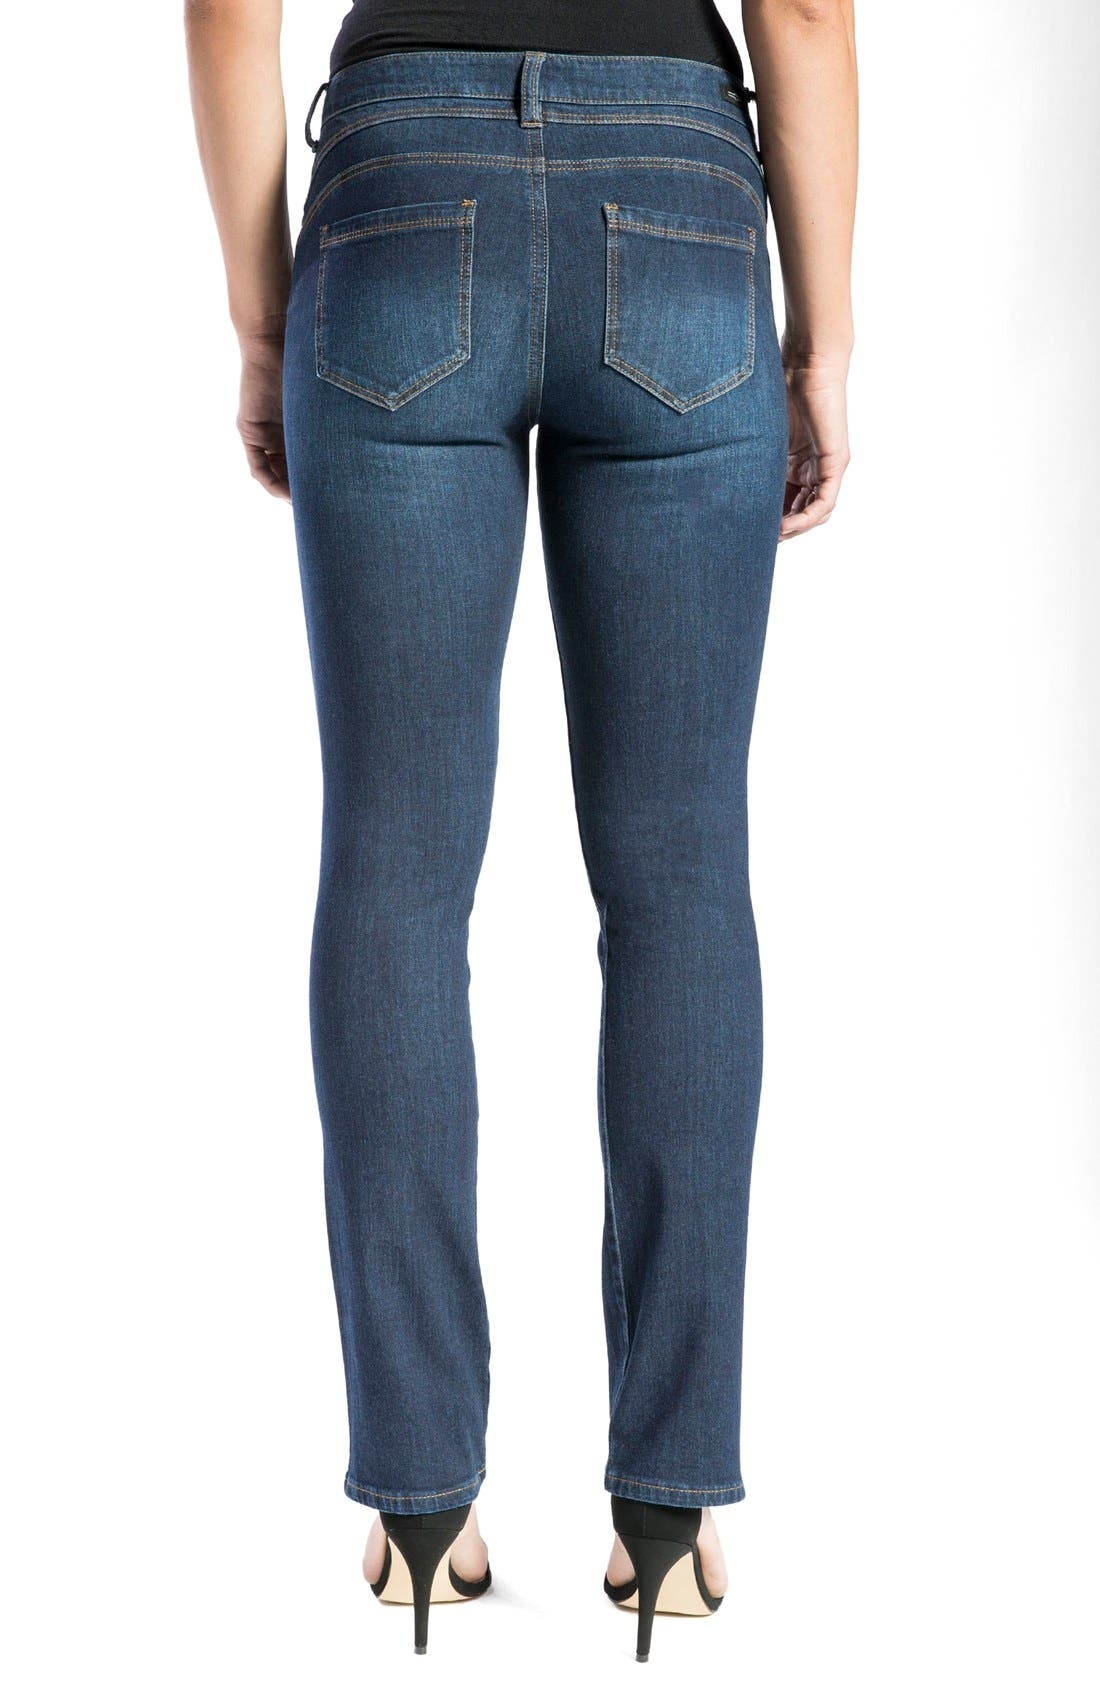 Alternate Image 2  - Liverpool Jeans Company 'Remy - Hugger' Straight Leg Jeans (Corvus)